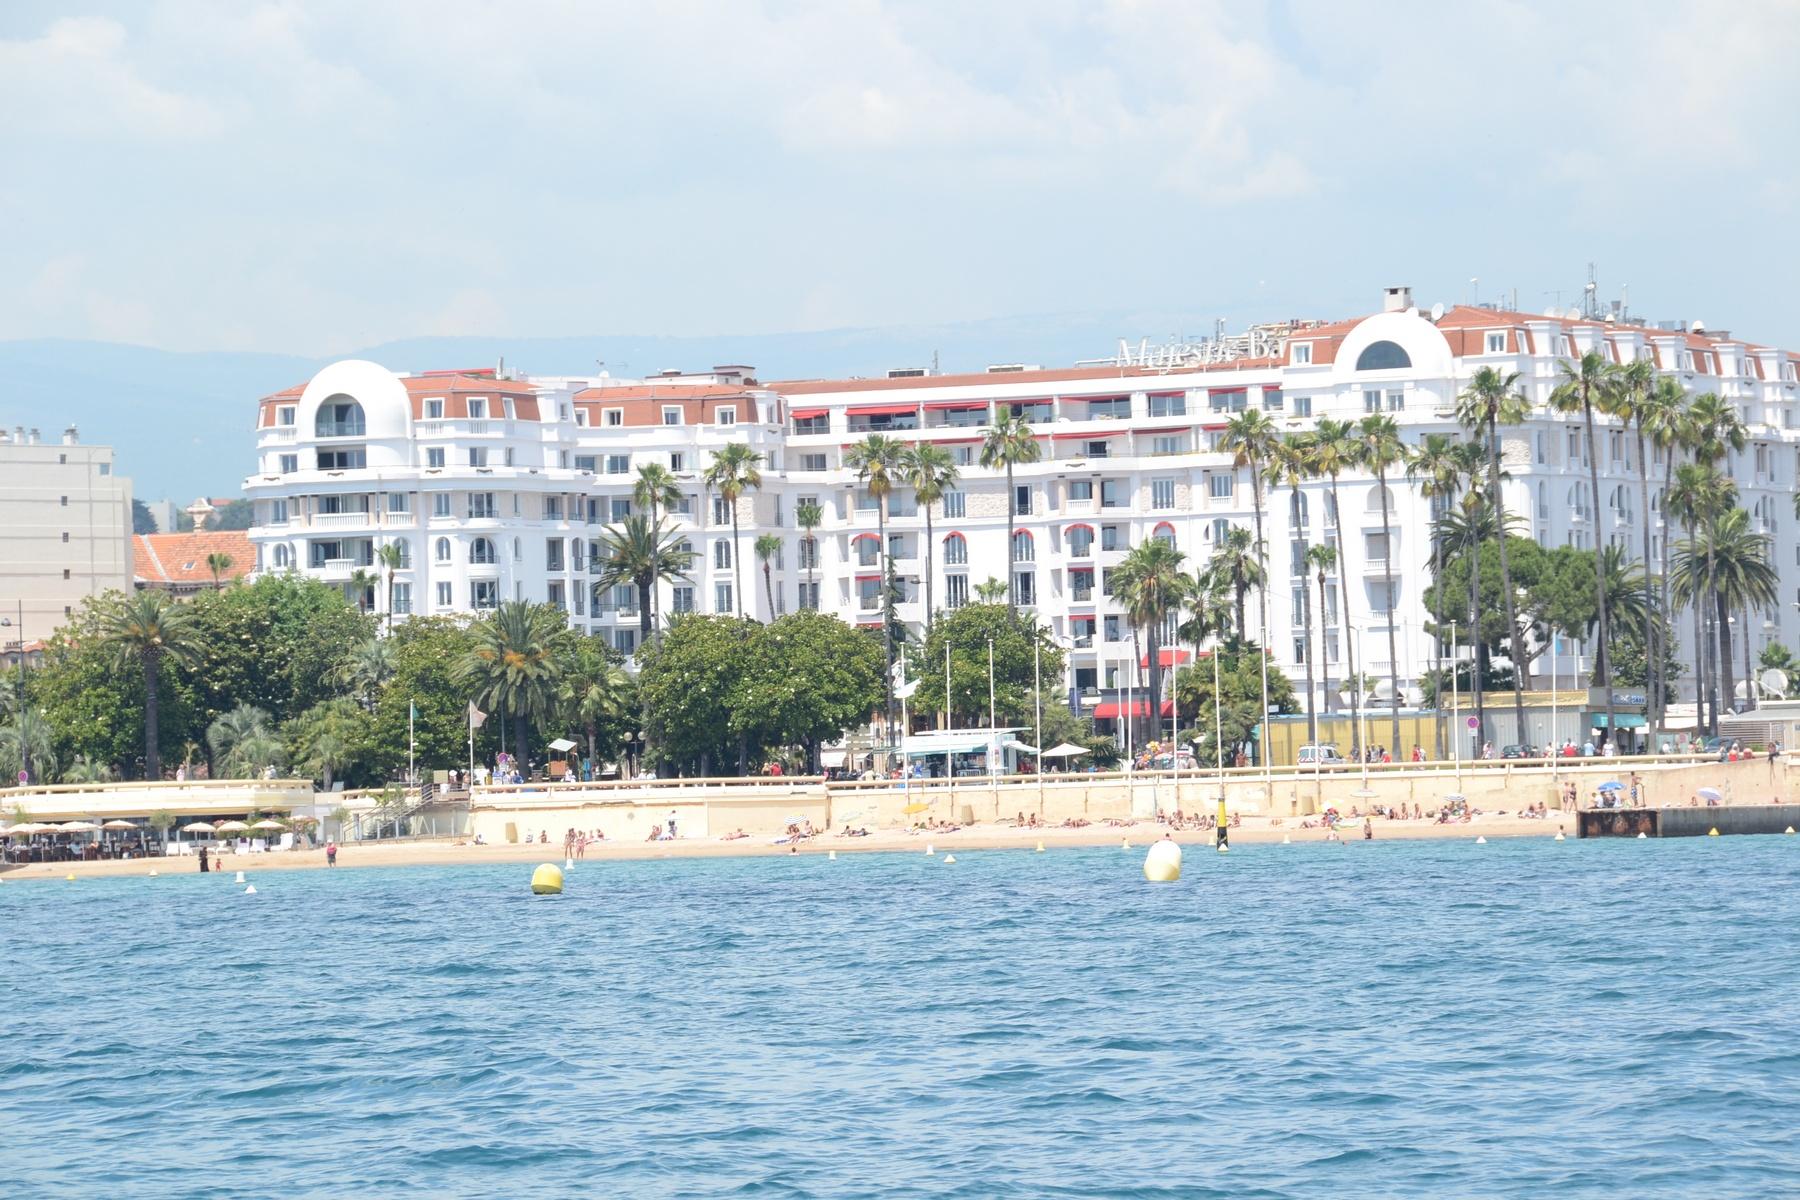 Majestic Hotel Cannes Cote d'Azur